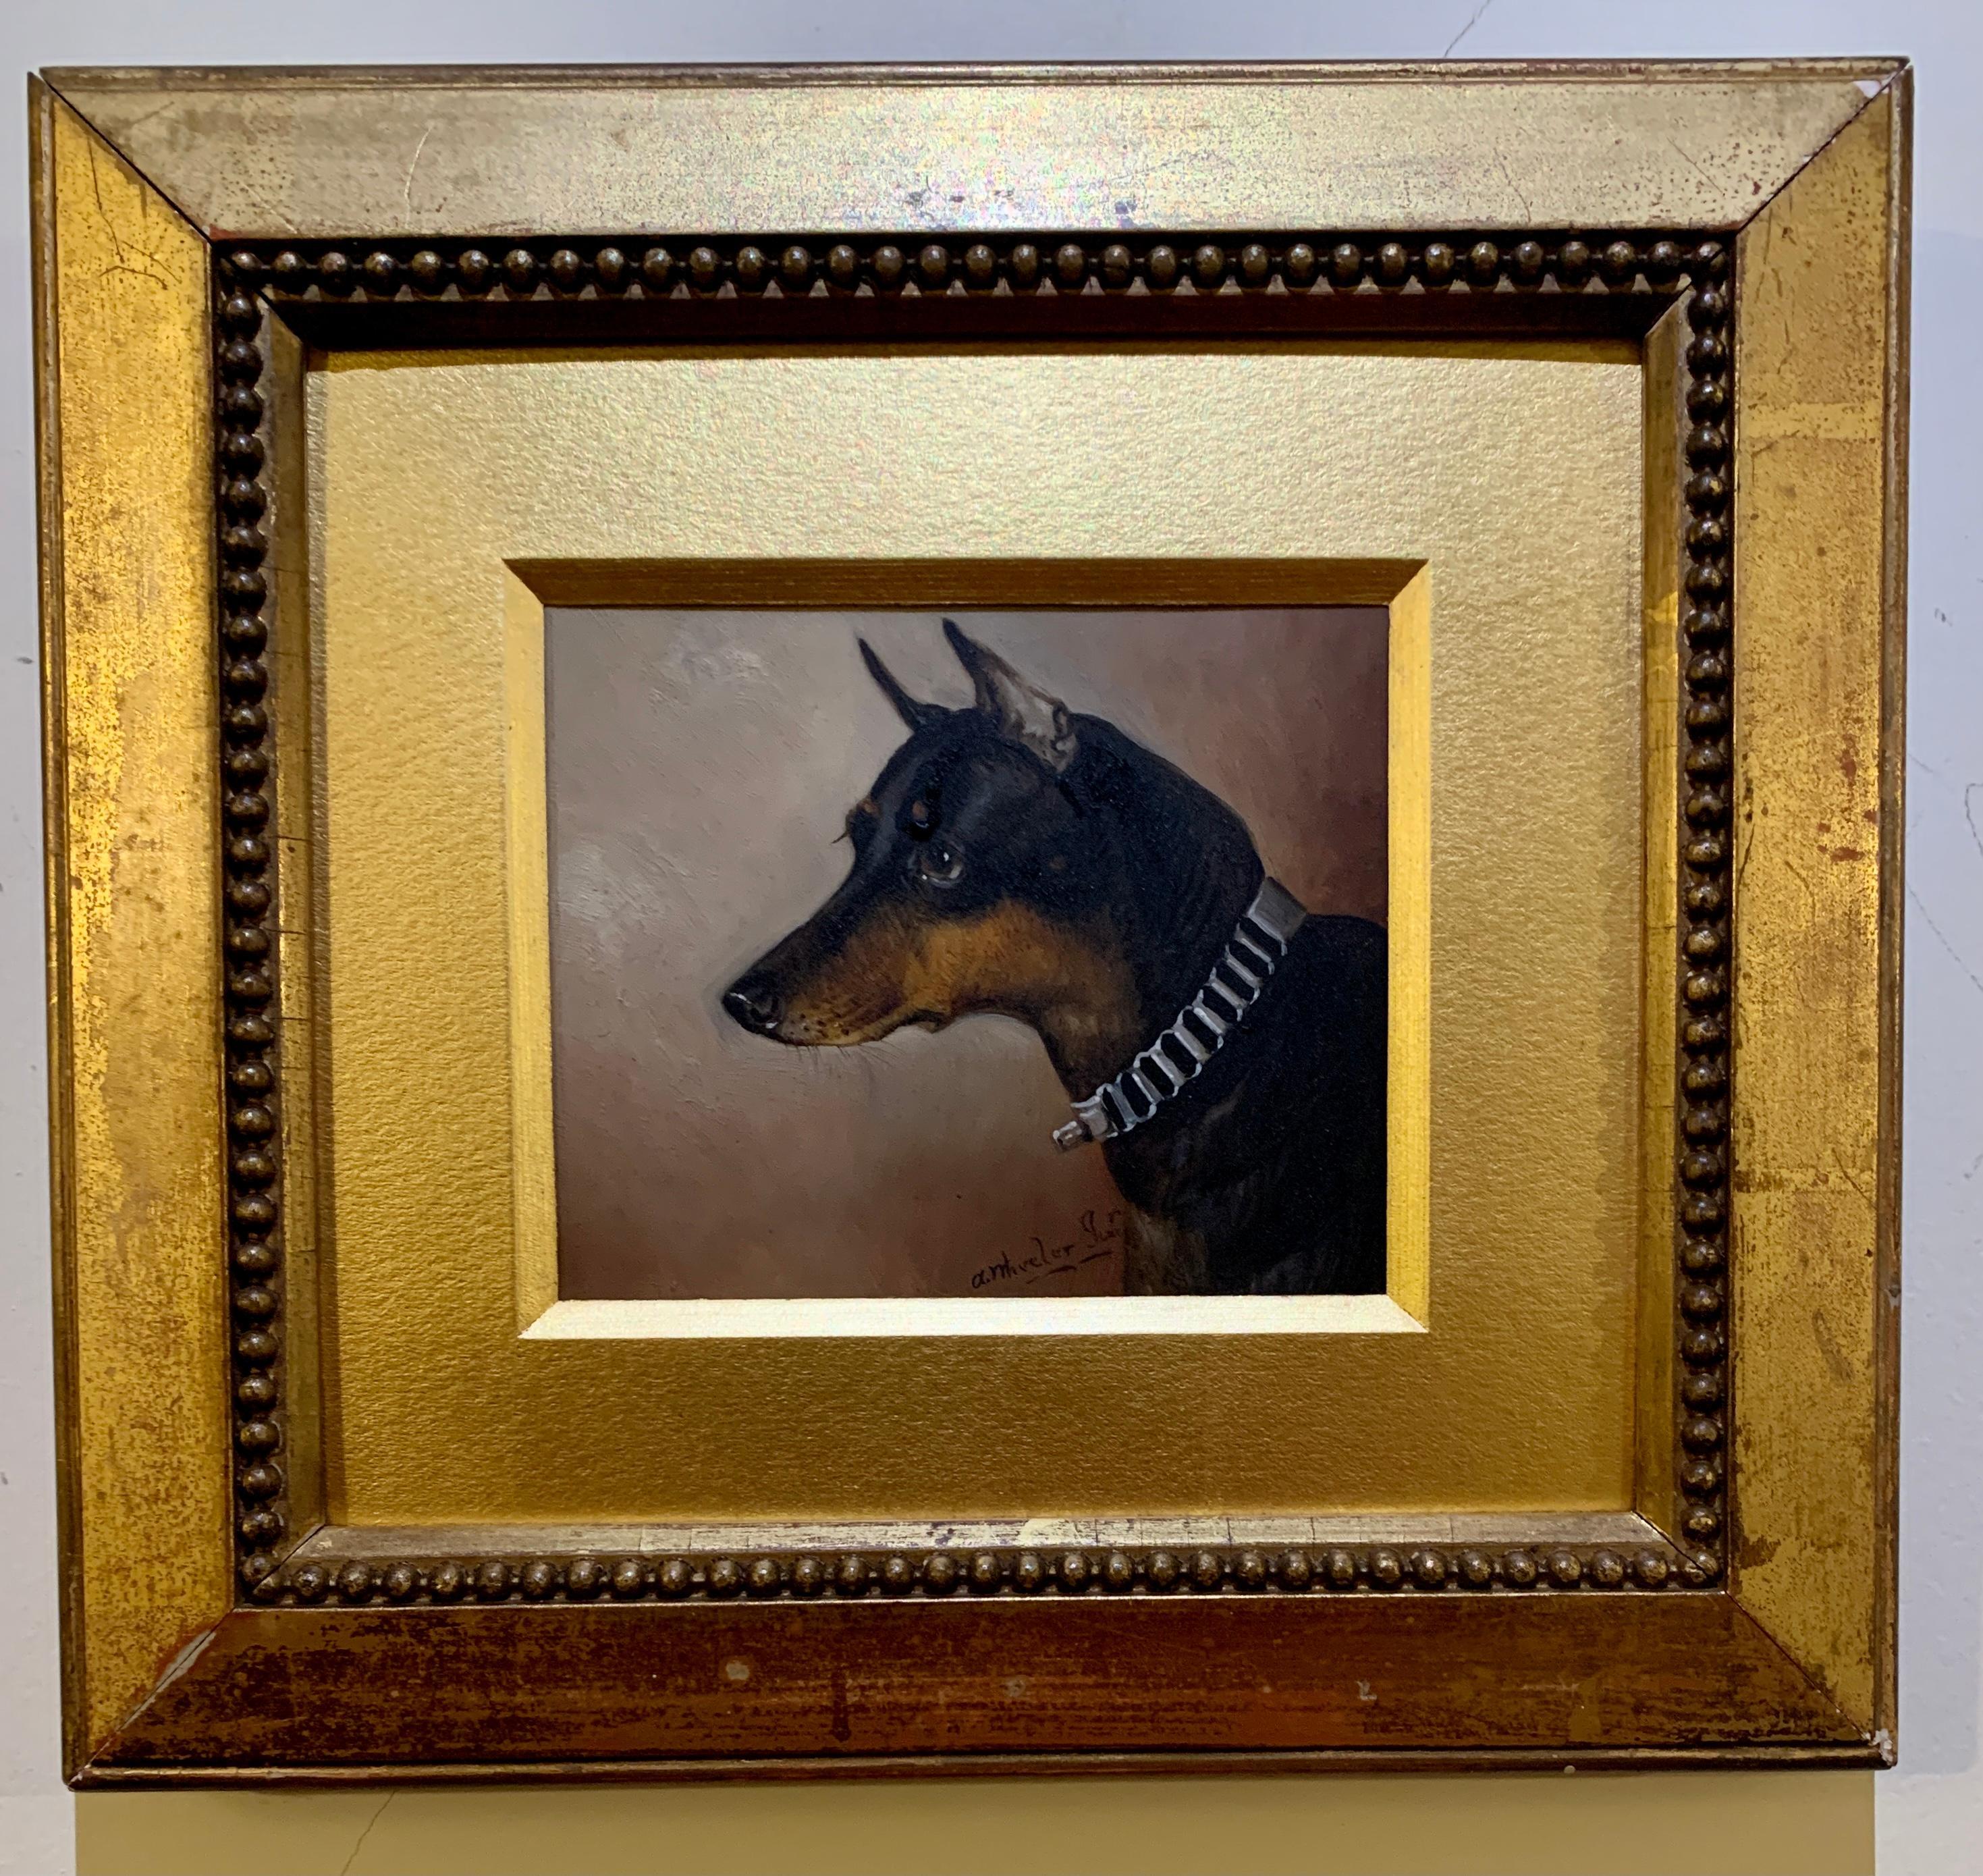 Victorian English 19th century portrait of a Pinscher dog.